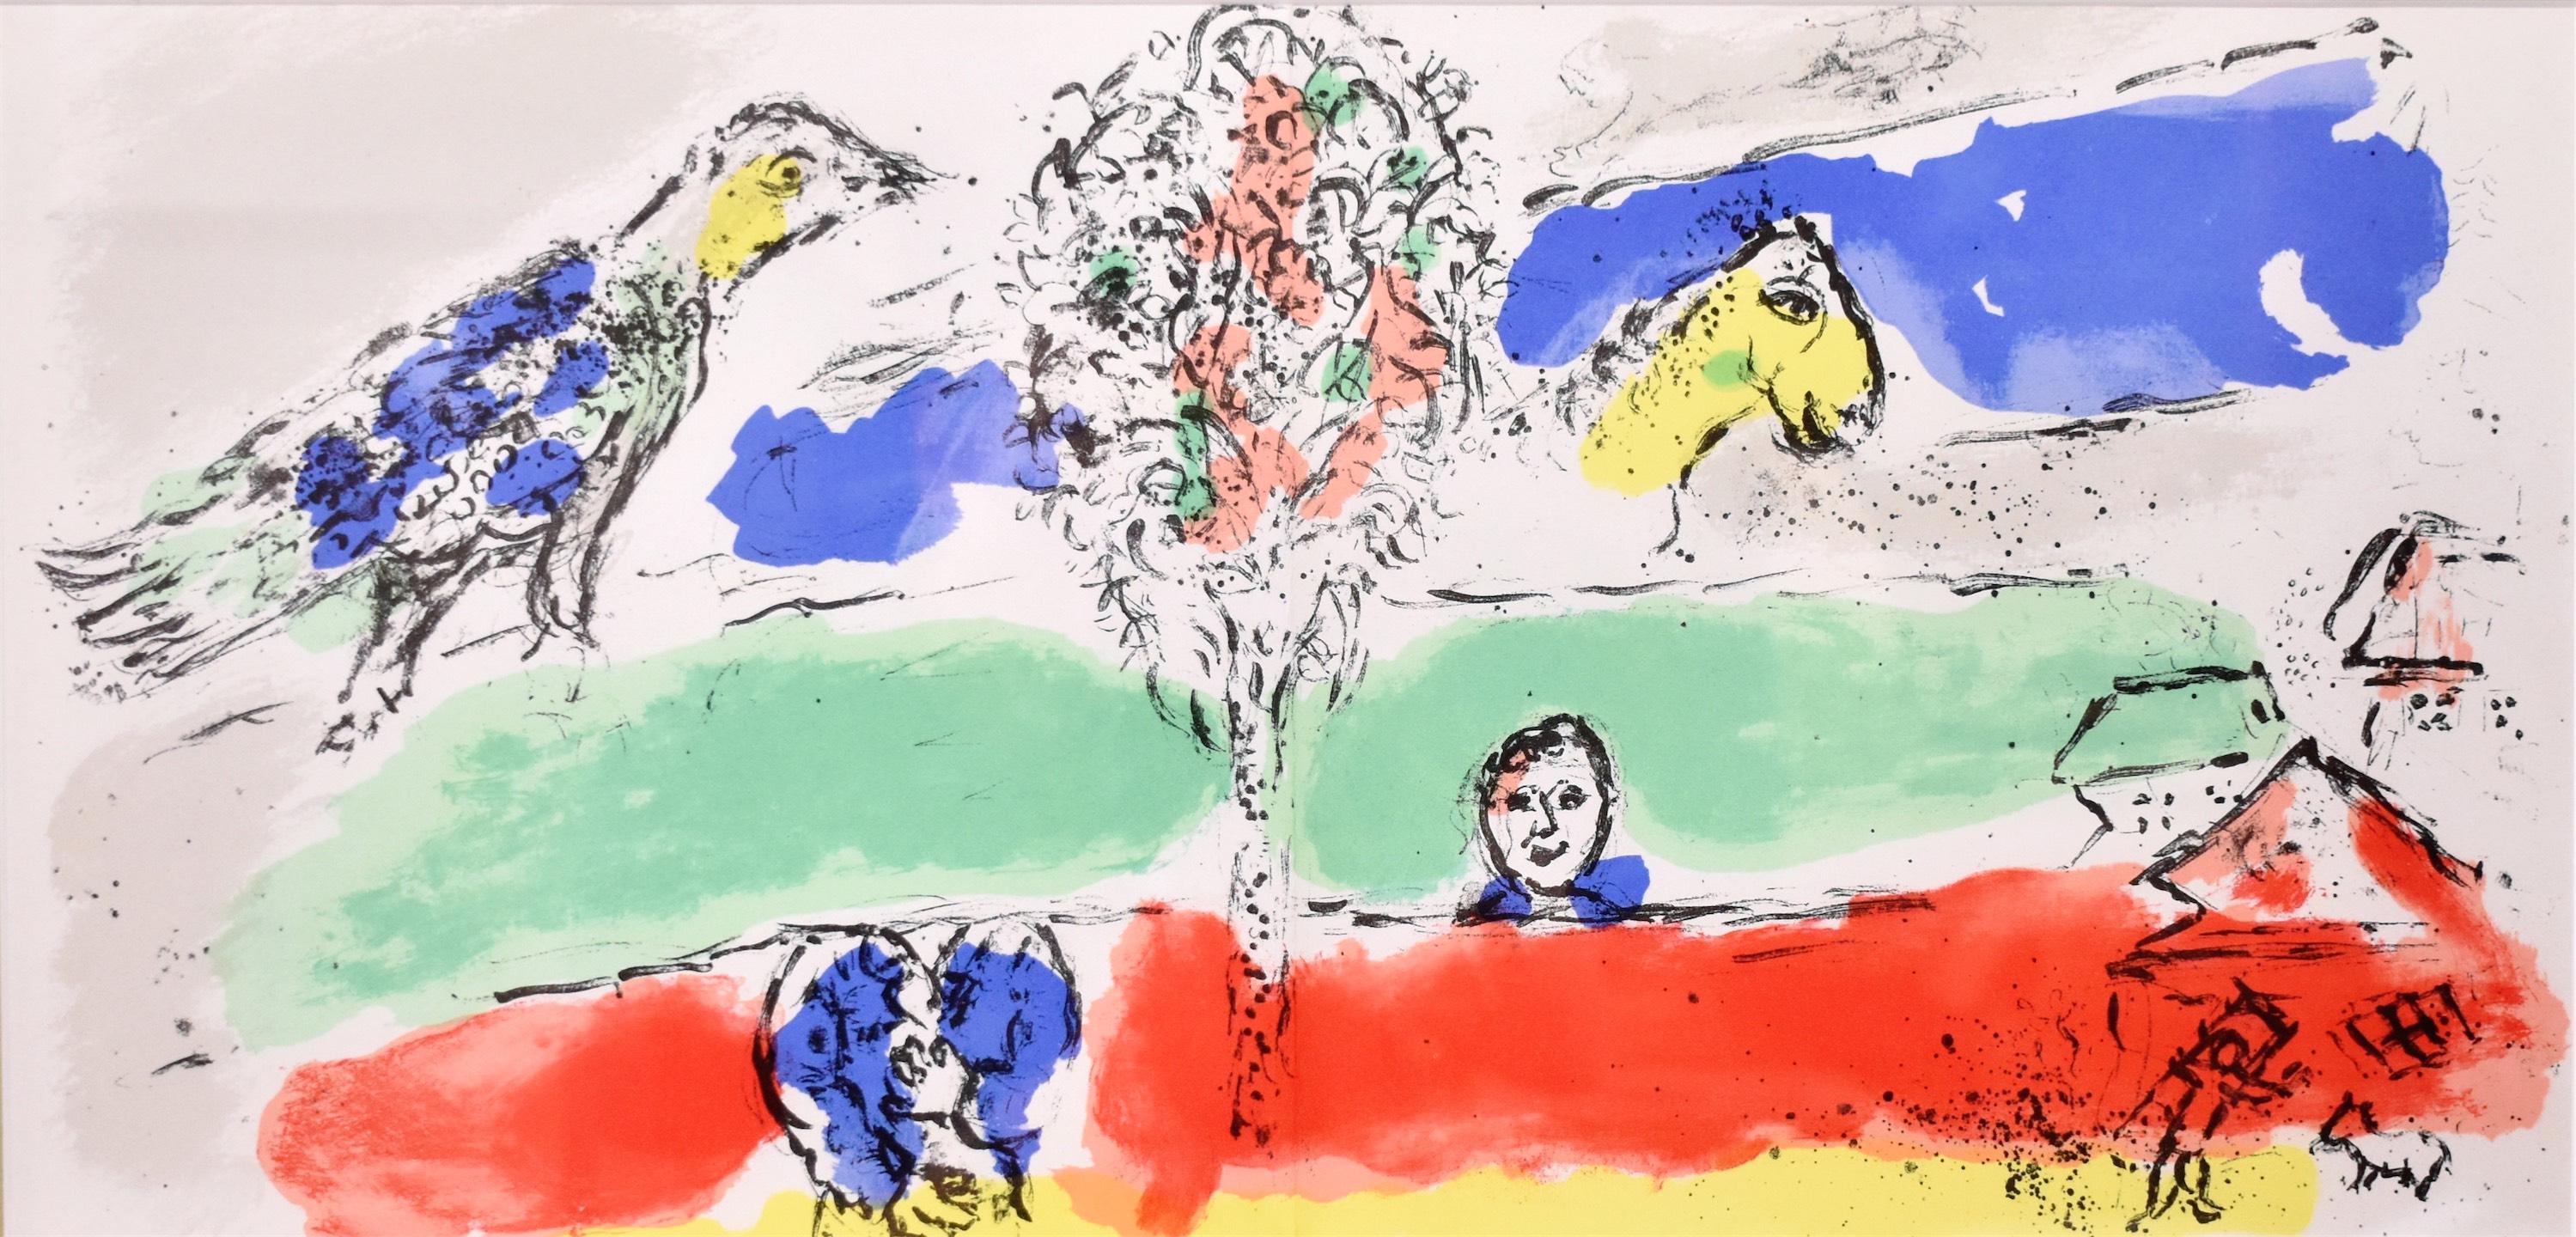 """Le Fleuve vert. Zielona rzeka"", 1974"